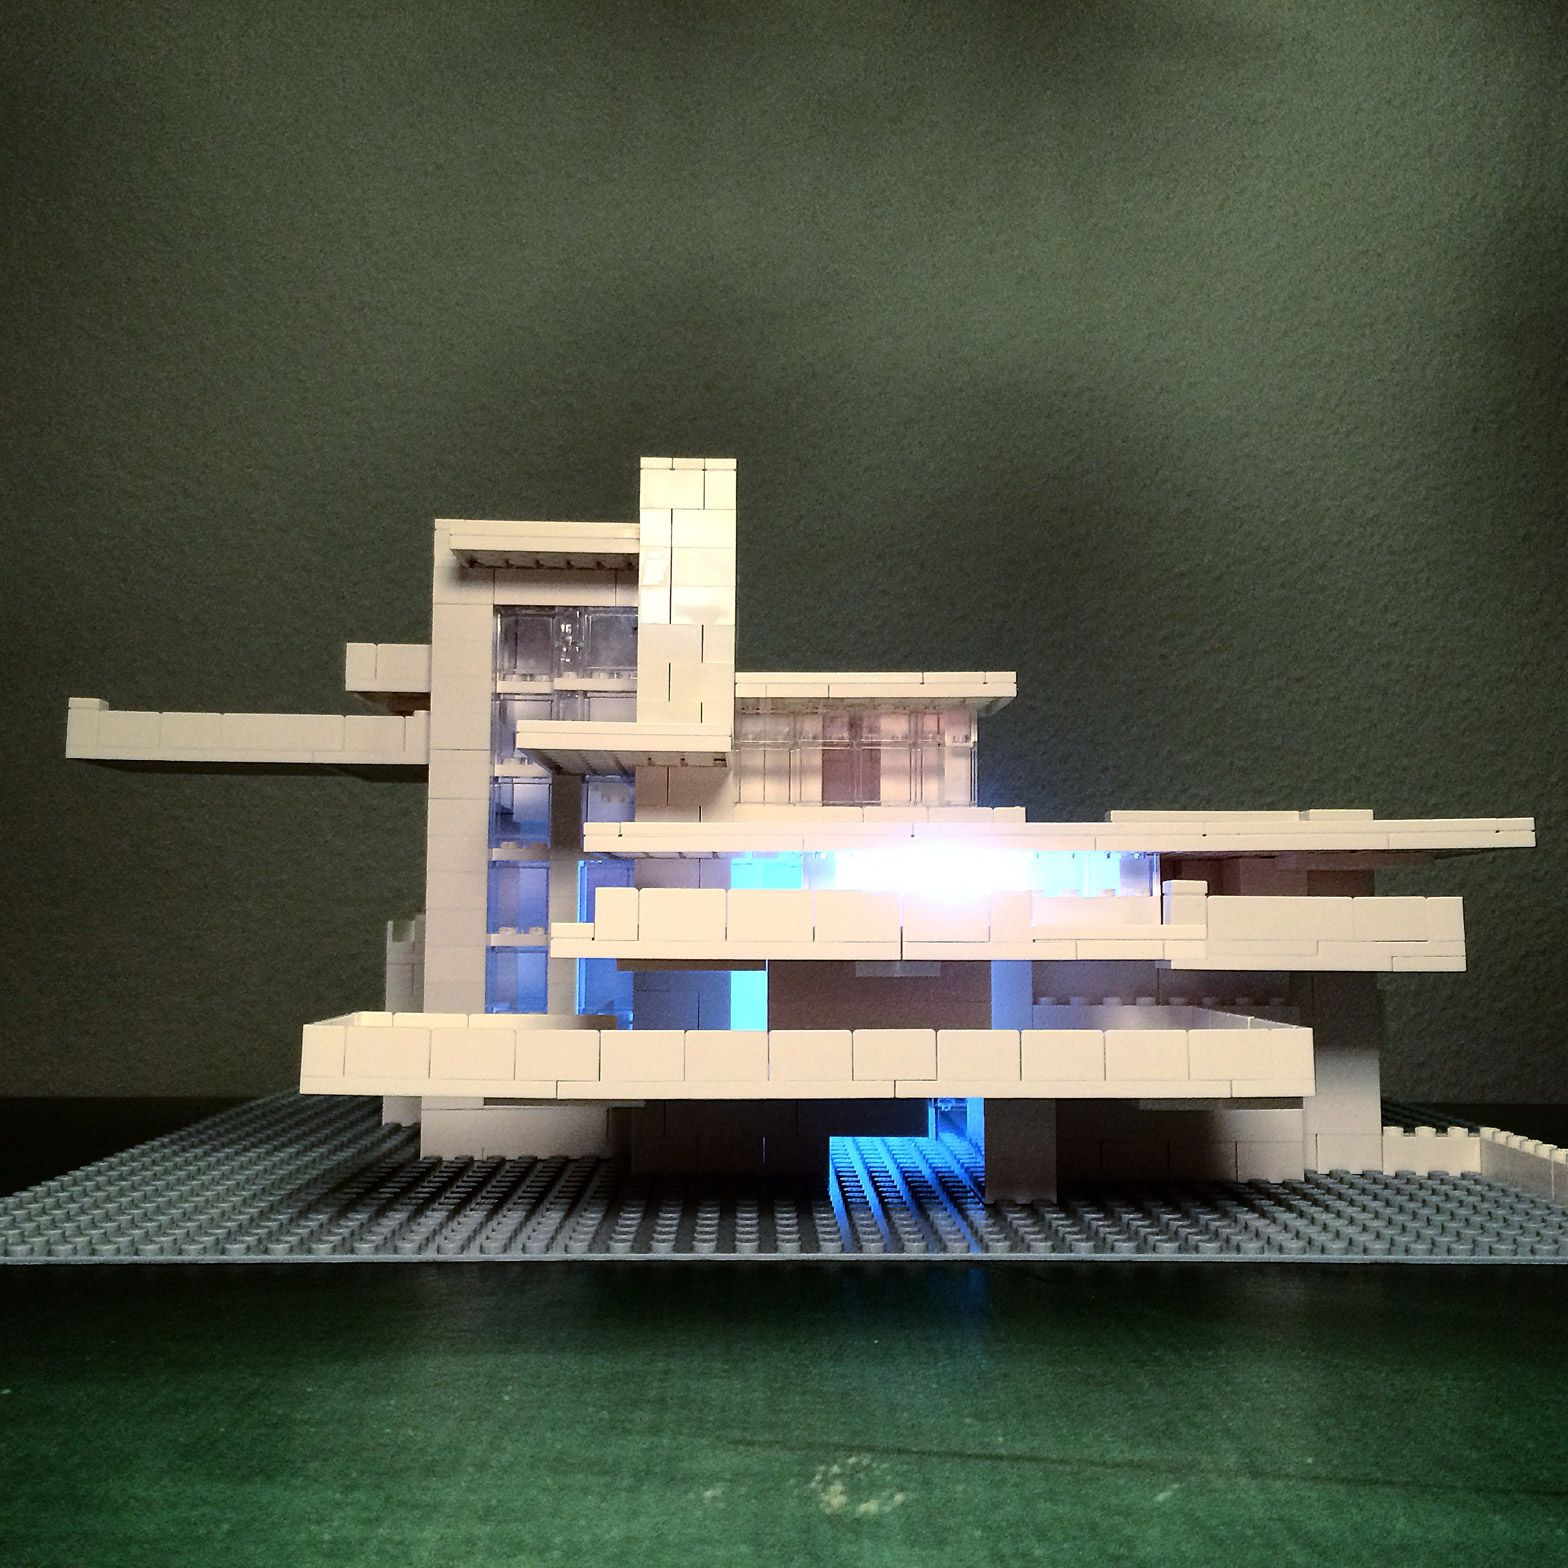 falling water by frank lloyd wright recreated in lego by arndt